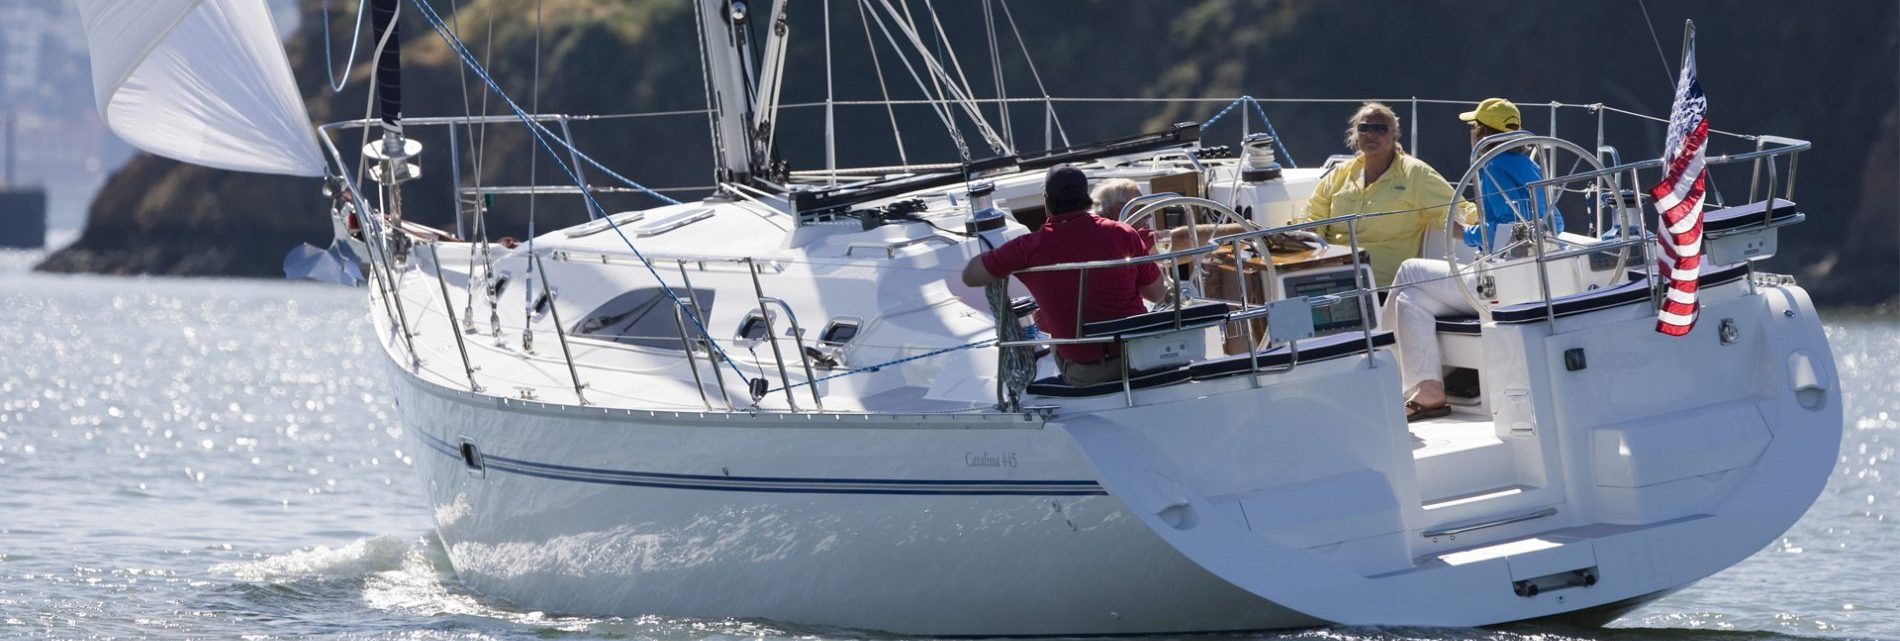 Welcome to Sail Annapolis | Annapolis, Maryland - Sail Annapolis